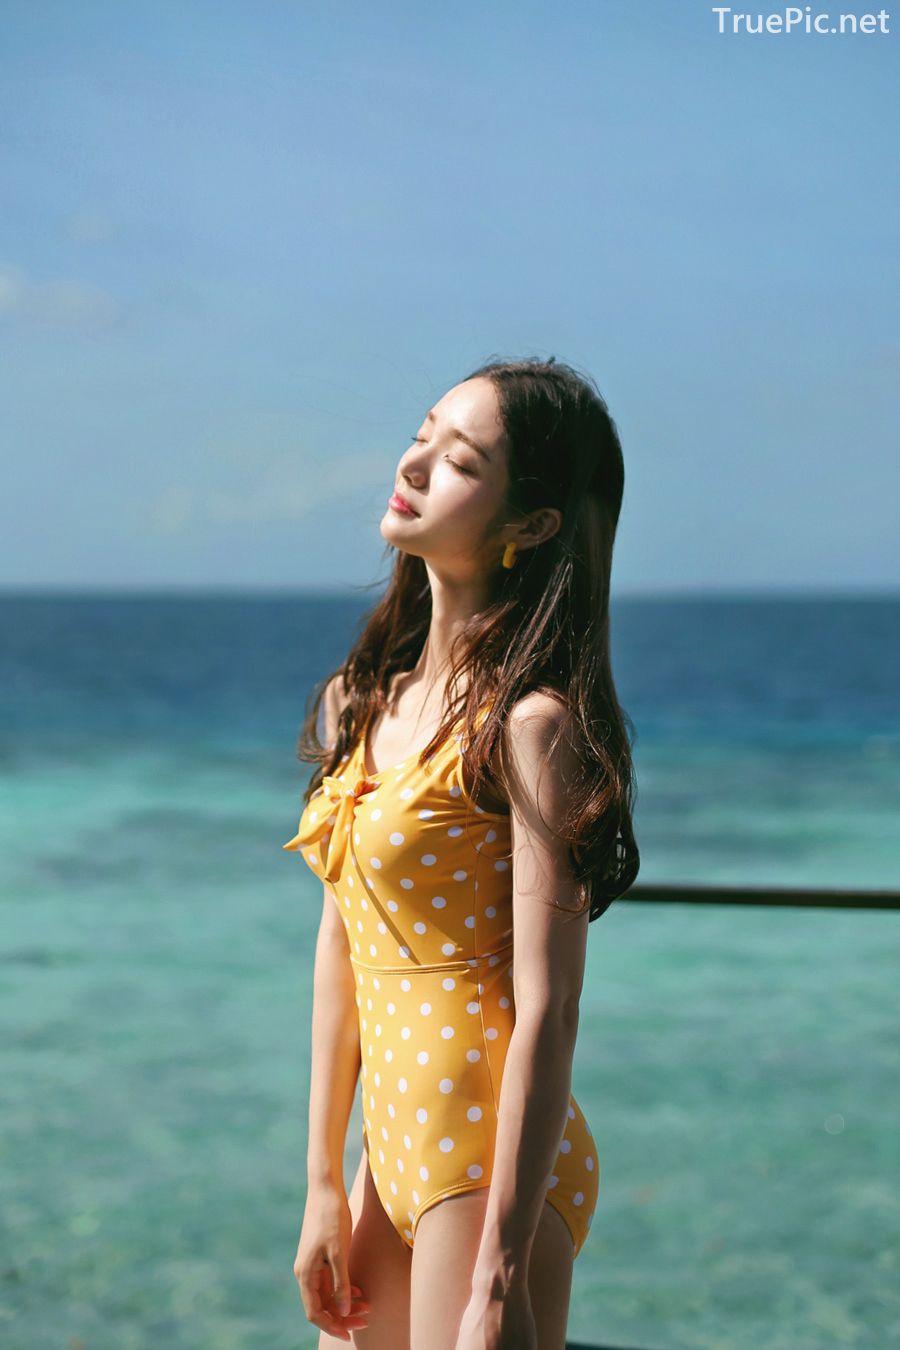 Korean fashion model Jeong Hee - Everyone once a monokini - Picture 4